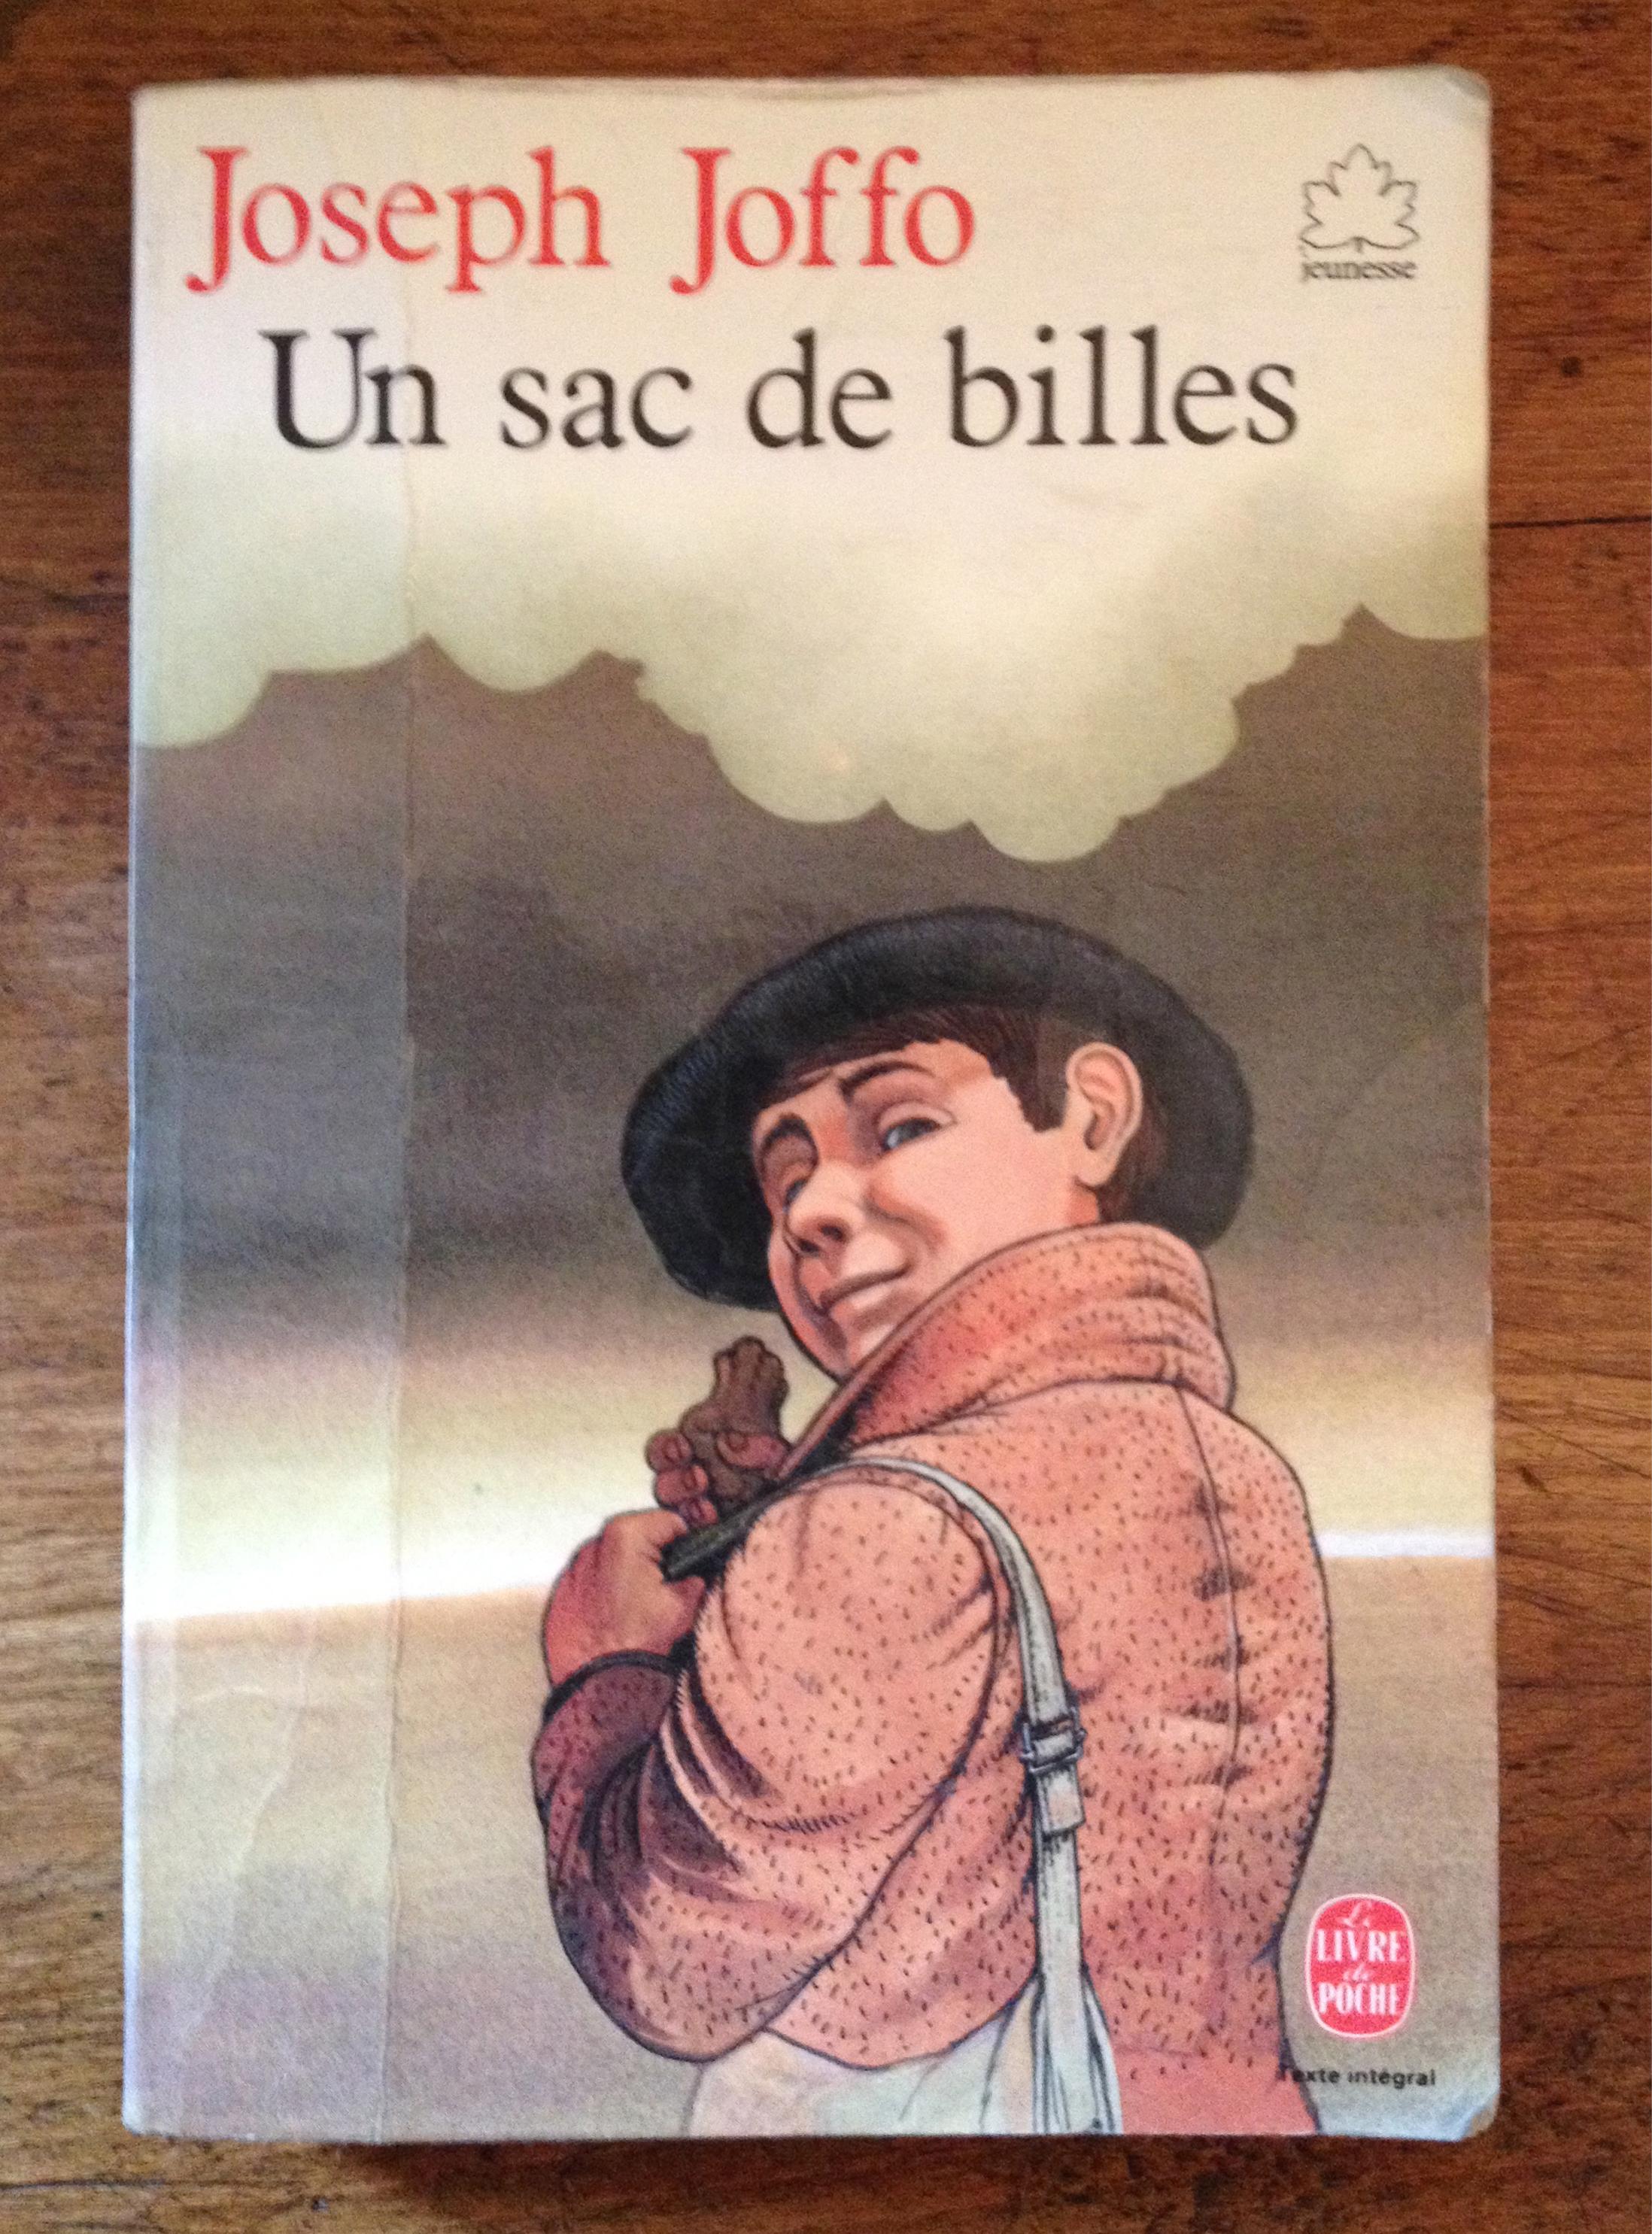 France, 2001